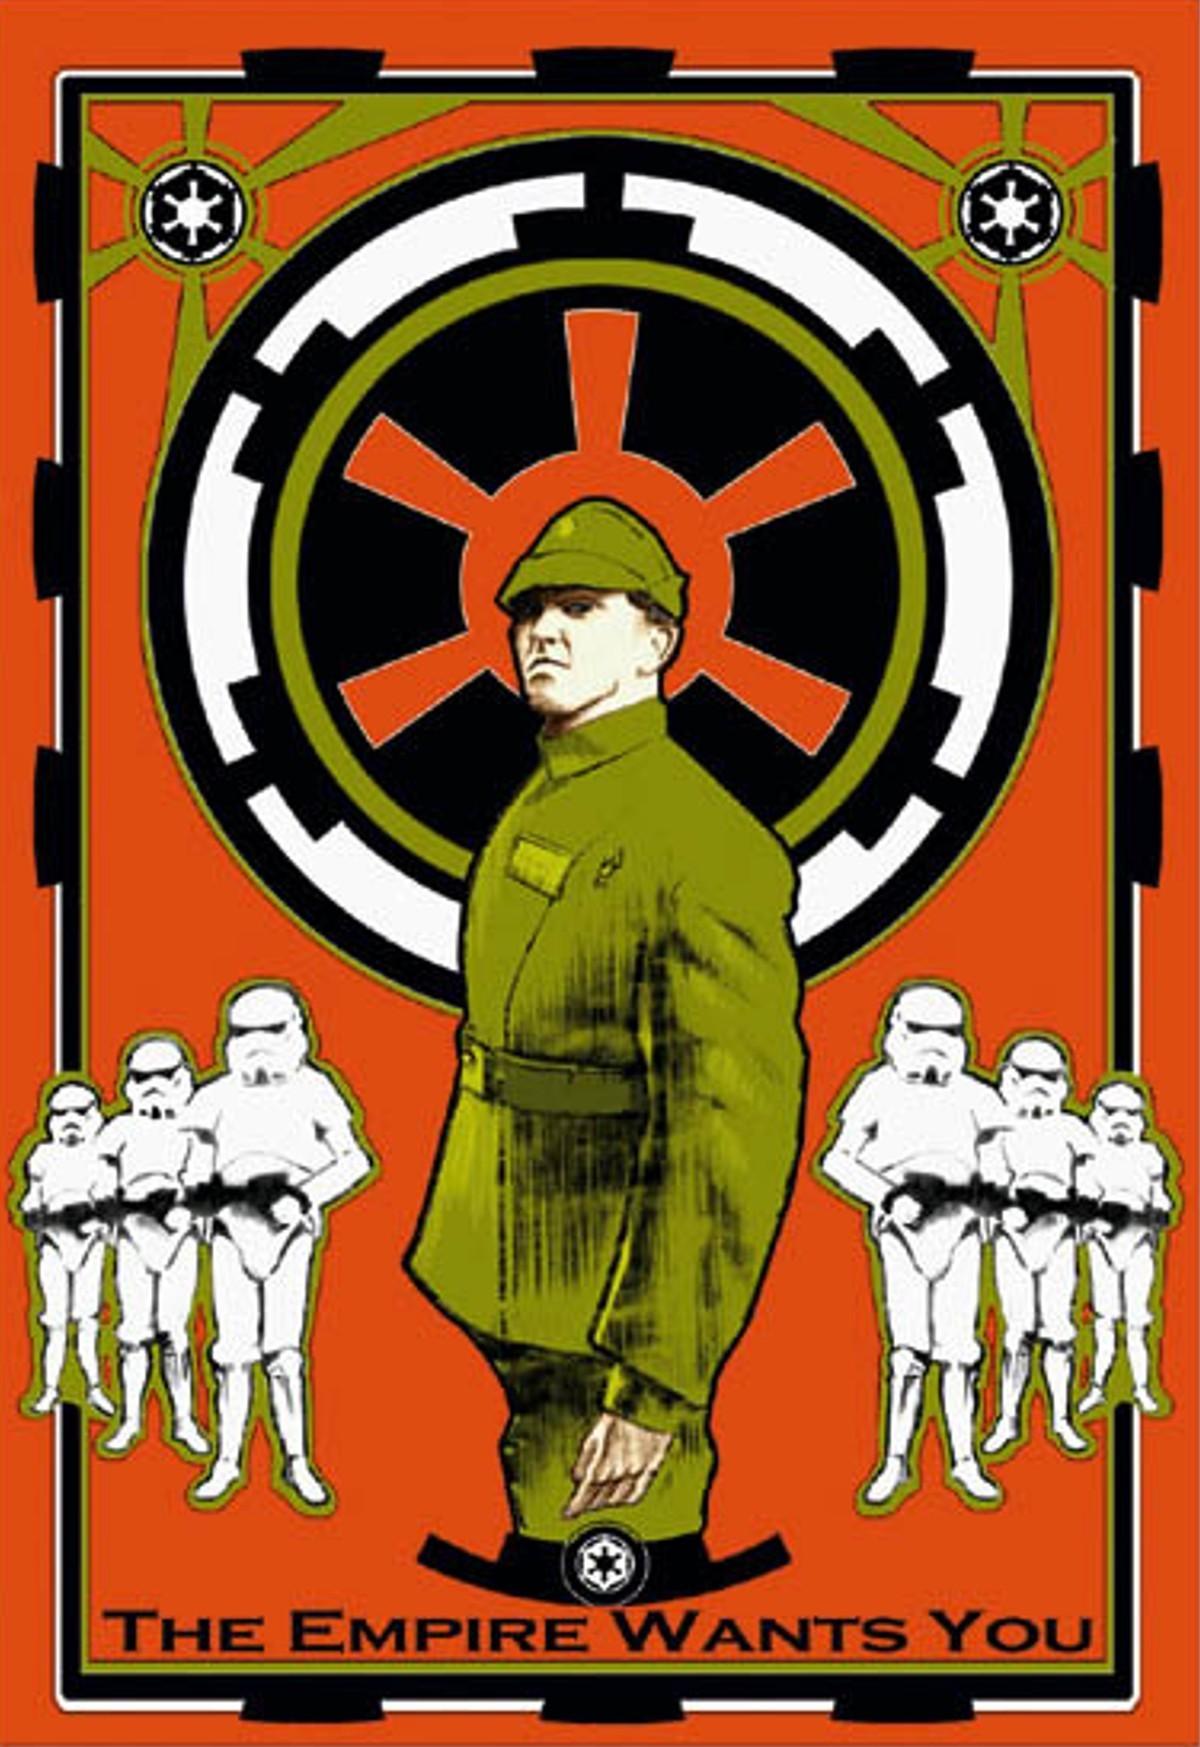 the-empire-wants-you-star-wars-propaganda